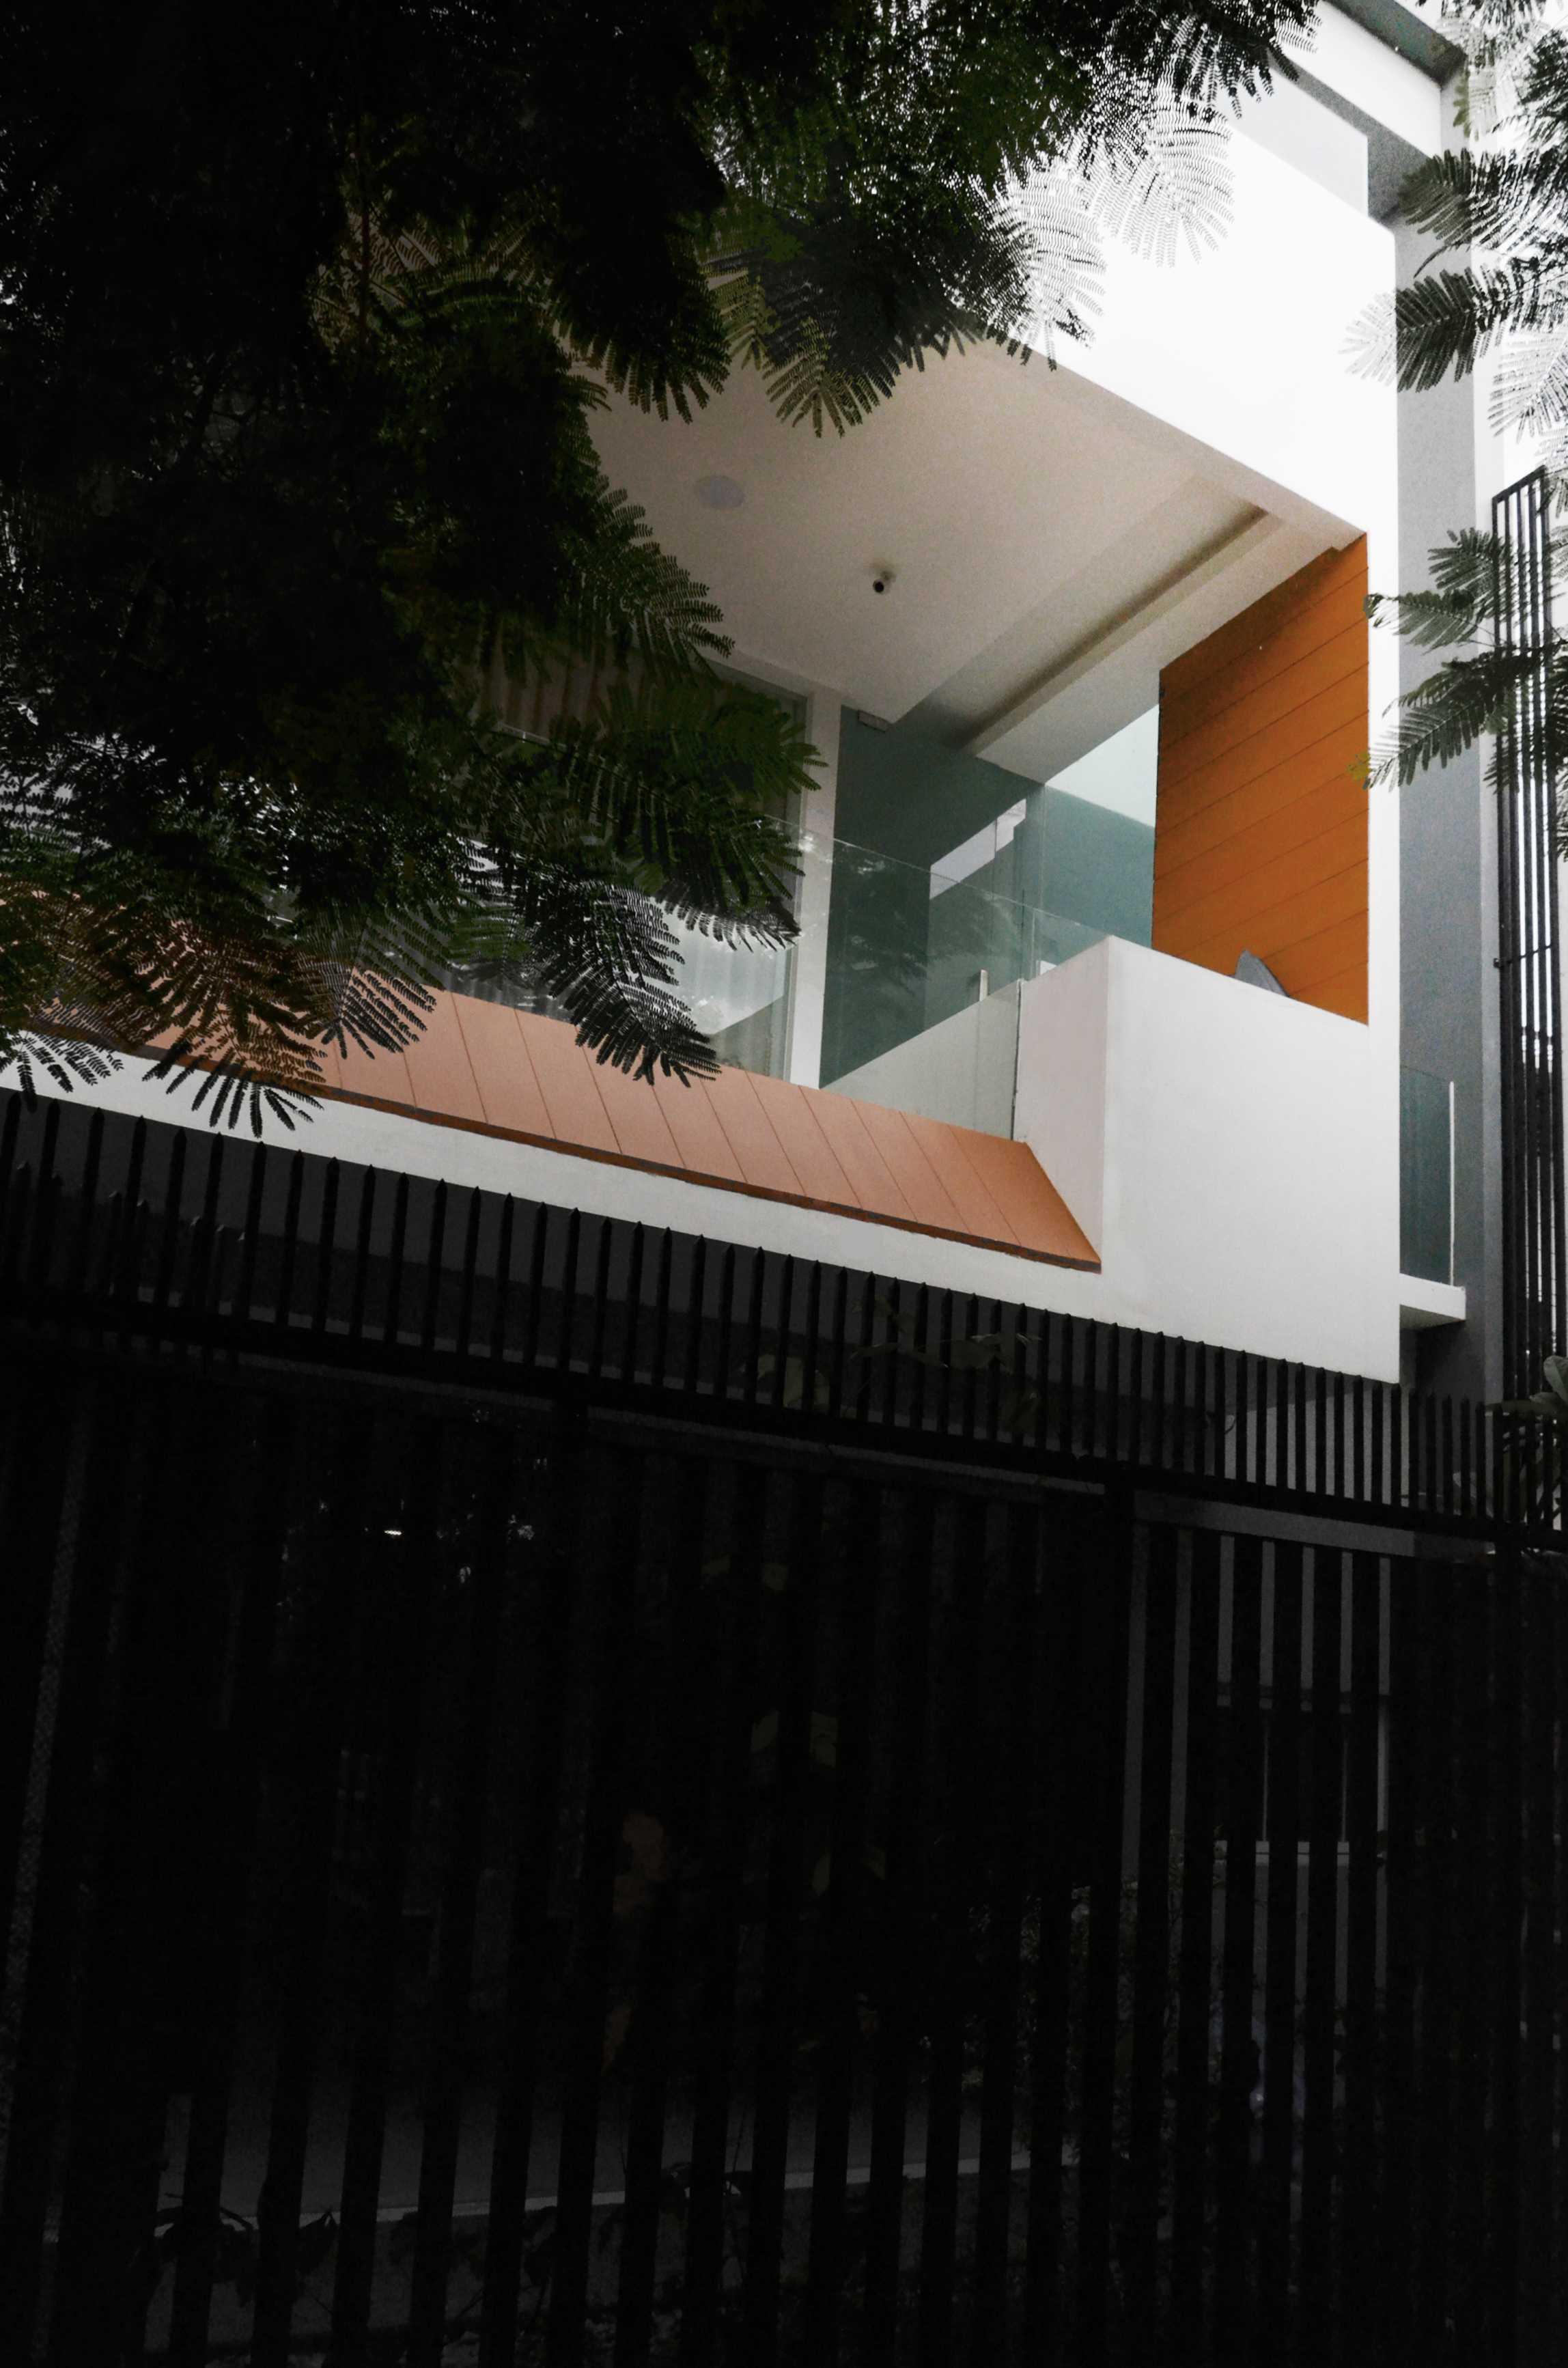 Oi Architect G House Tangerang, Kota Tangerang, Banten, Indonesia Tangerang, Kota Tangerang, Banten, Indonesia Oi-Architect-G-House   90265